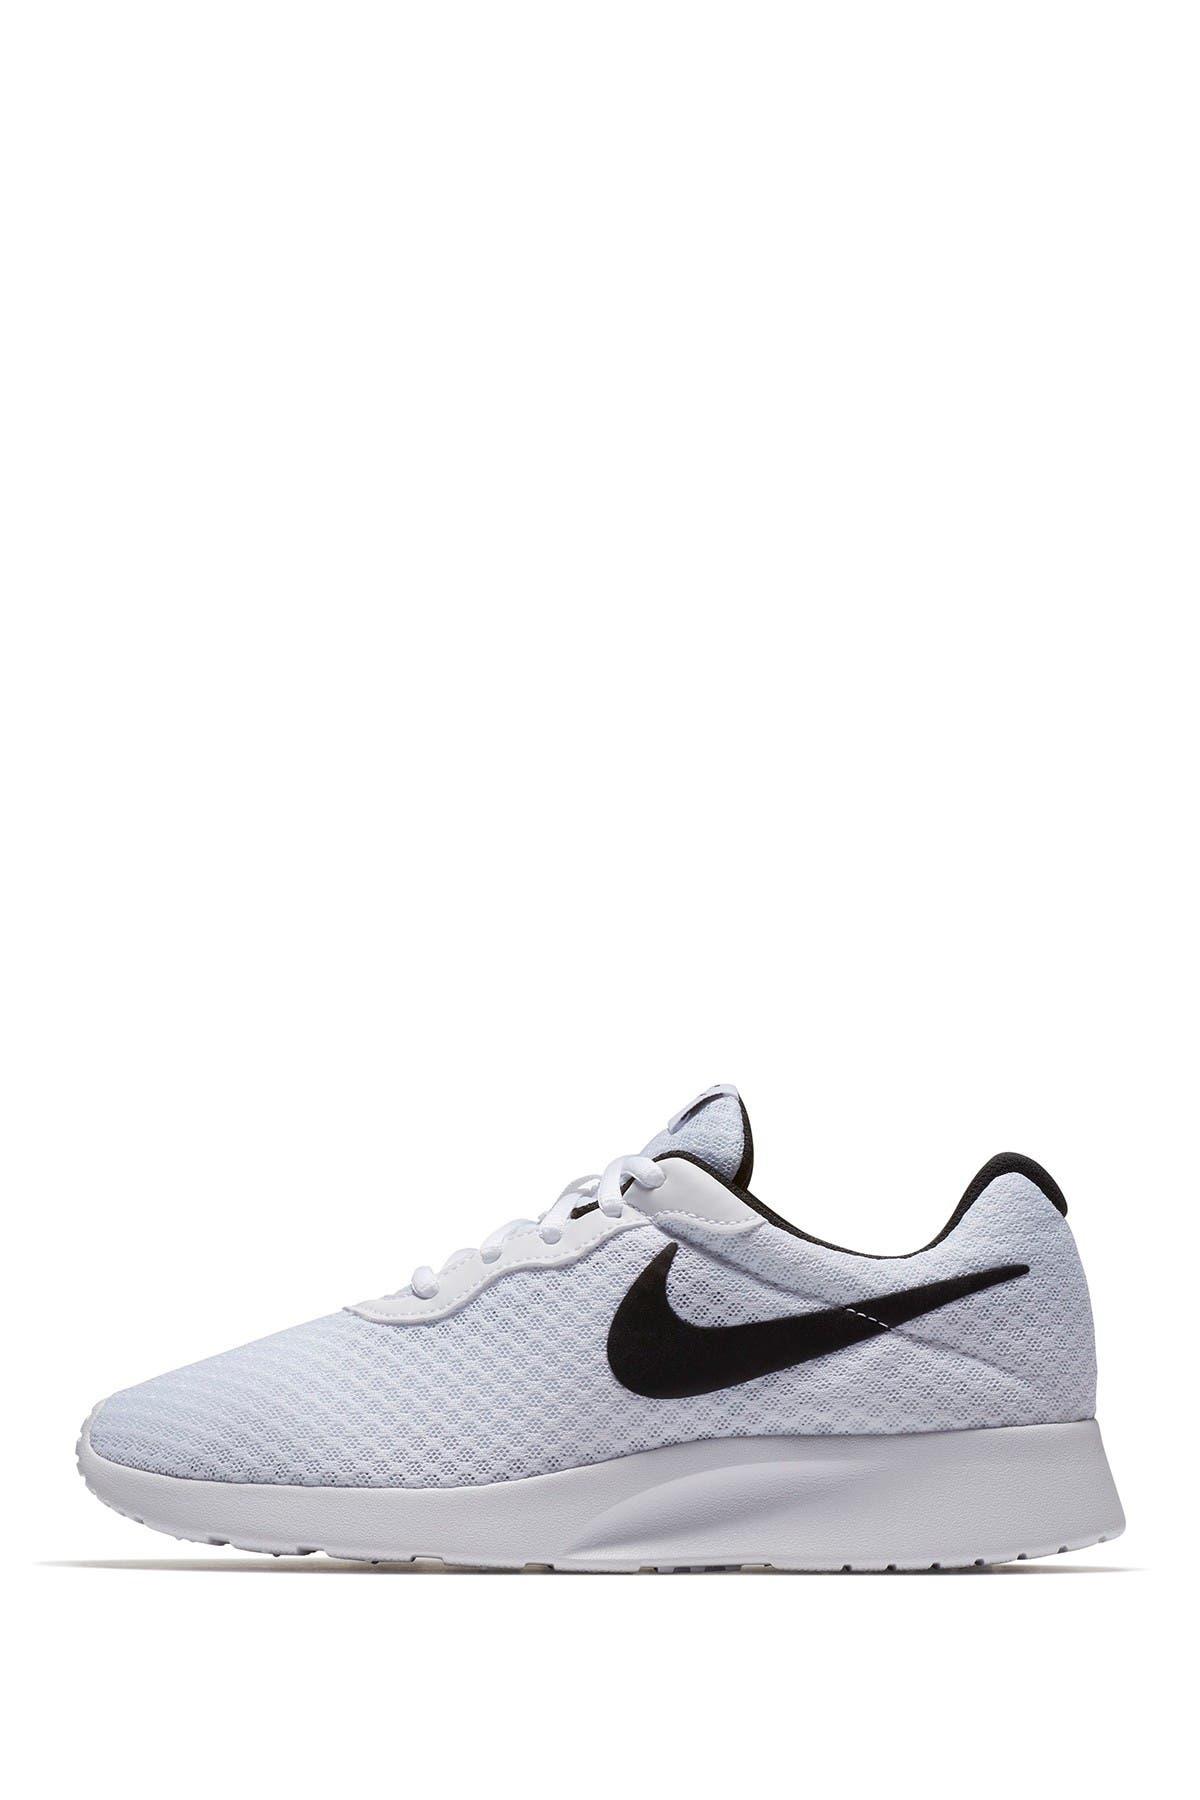 secundario Cortés Fraternidad  Nike | Tanjun Sneaker | Nordstrom Rack